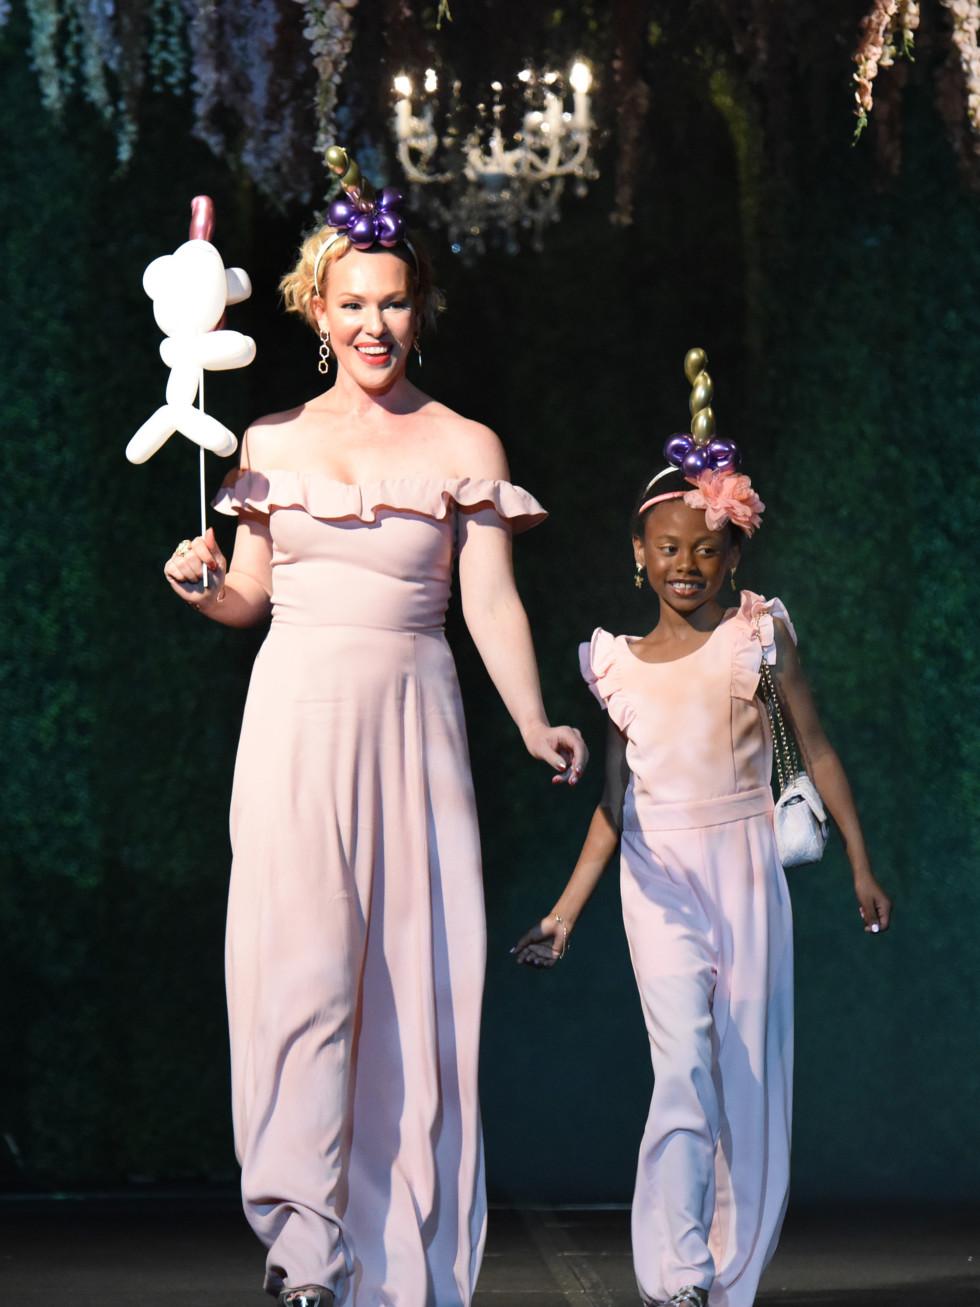 Sha'Khia Johnson, 8, Mesquite: Erin Cummings, actress, from LA